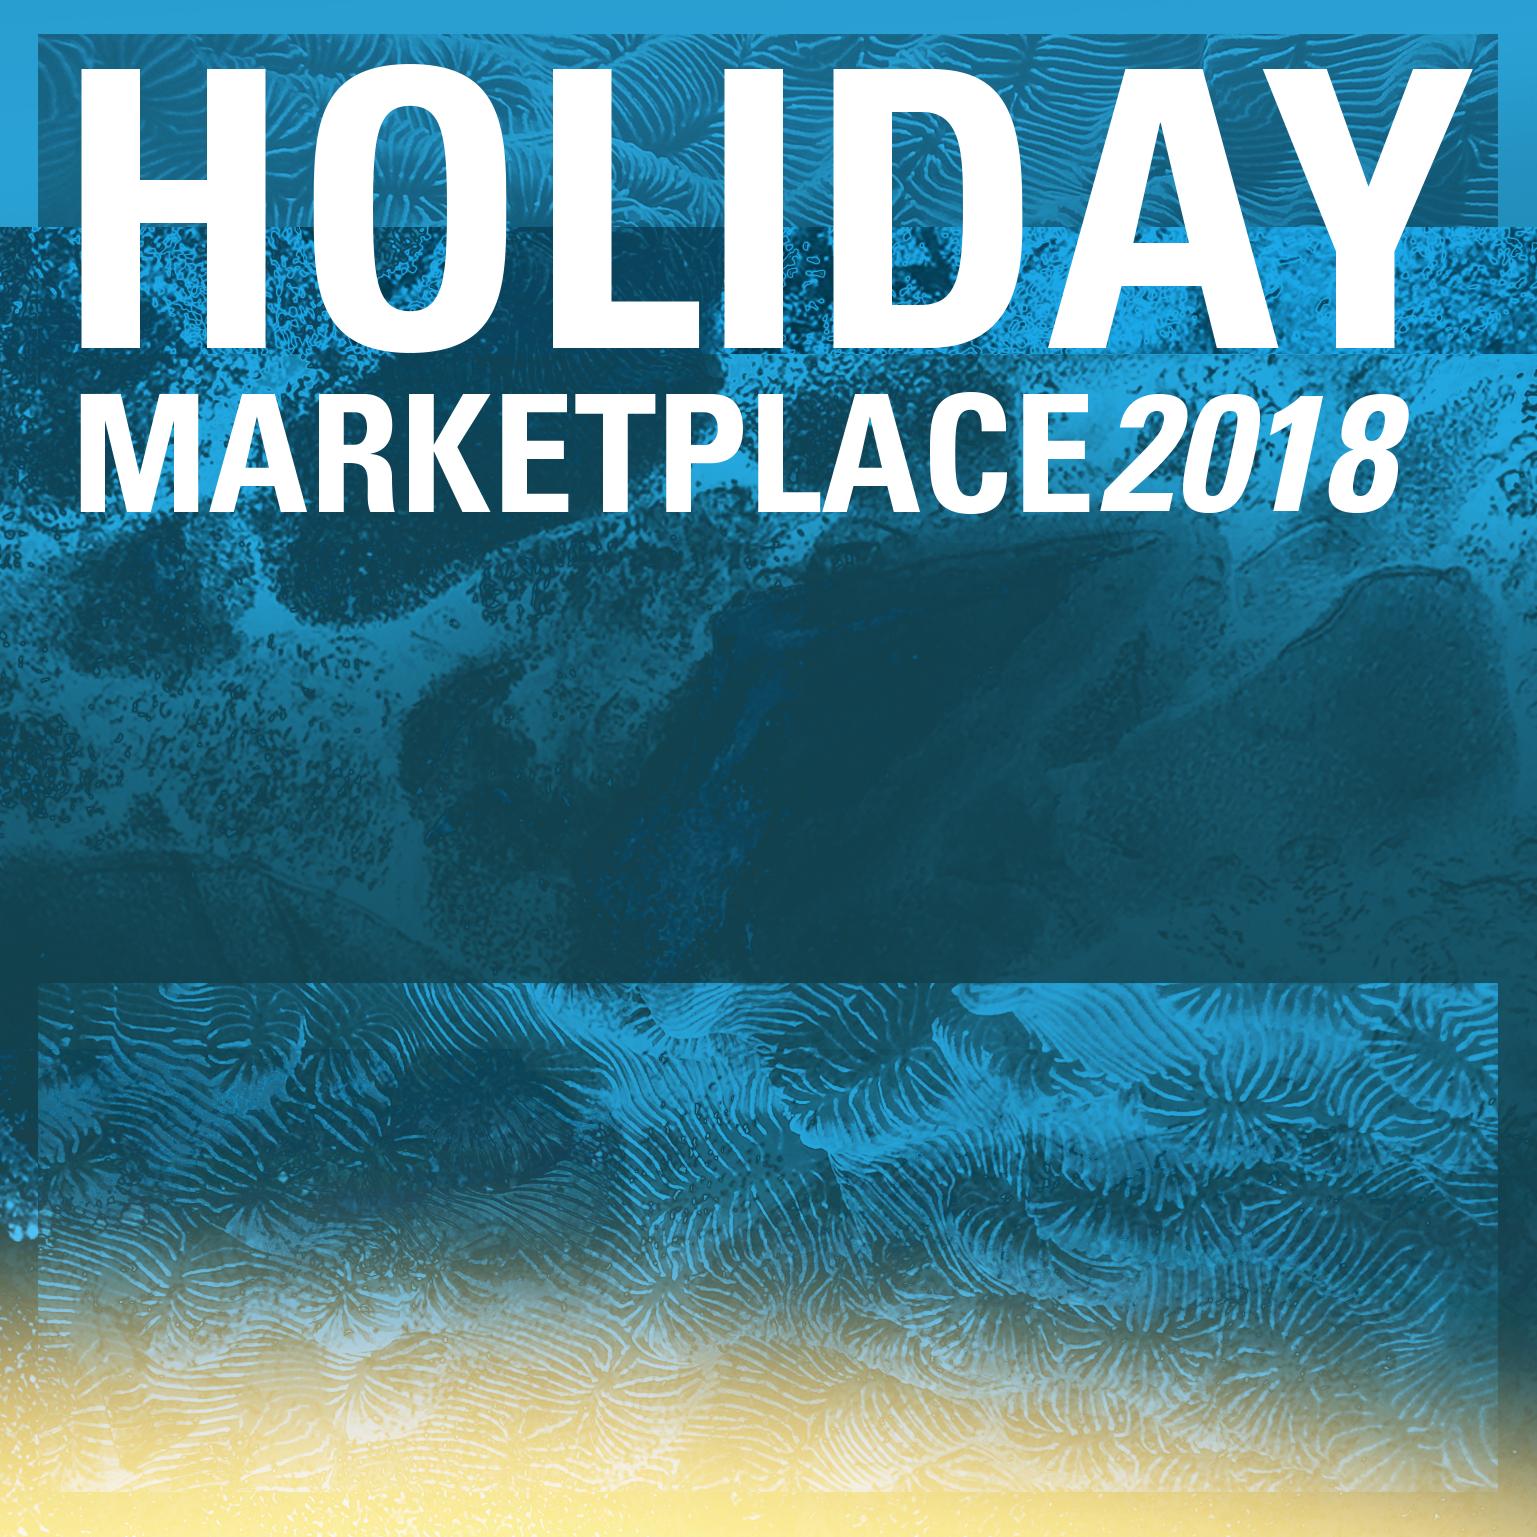 HOLIDAY+MARKETPLACE+2018+sq.png